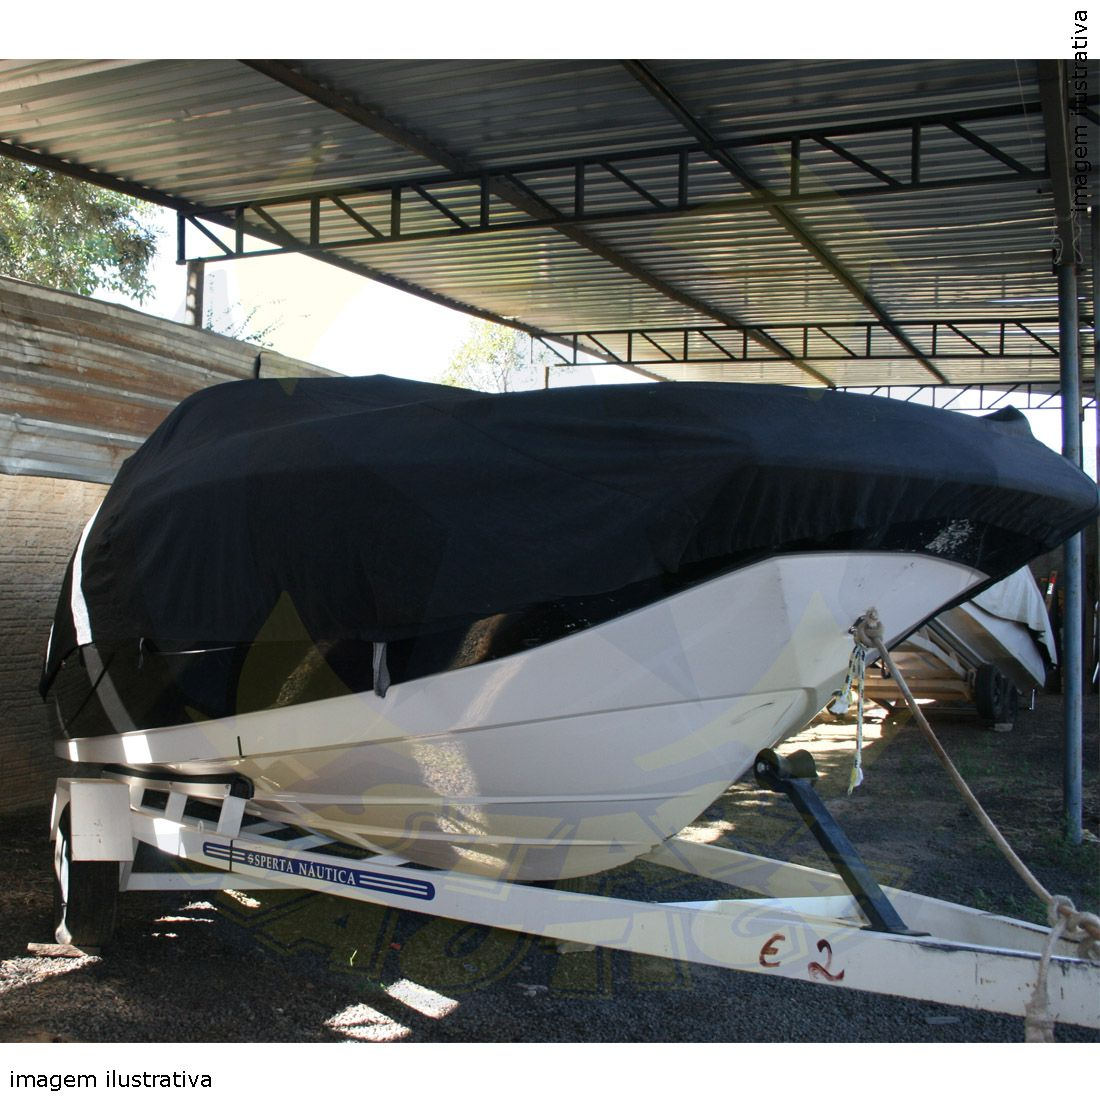 Capa Lona de Cobertura Lancha FS 210 Lona Emborrachada